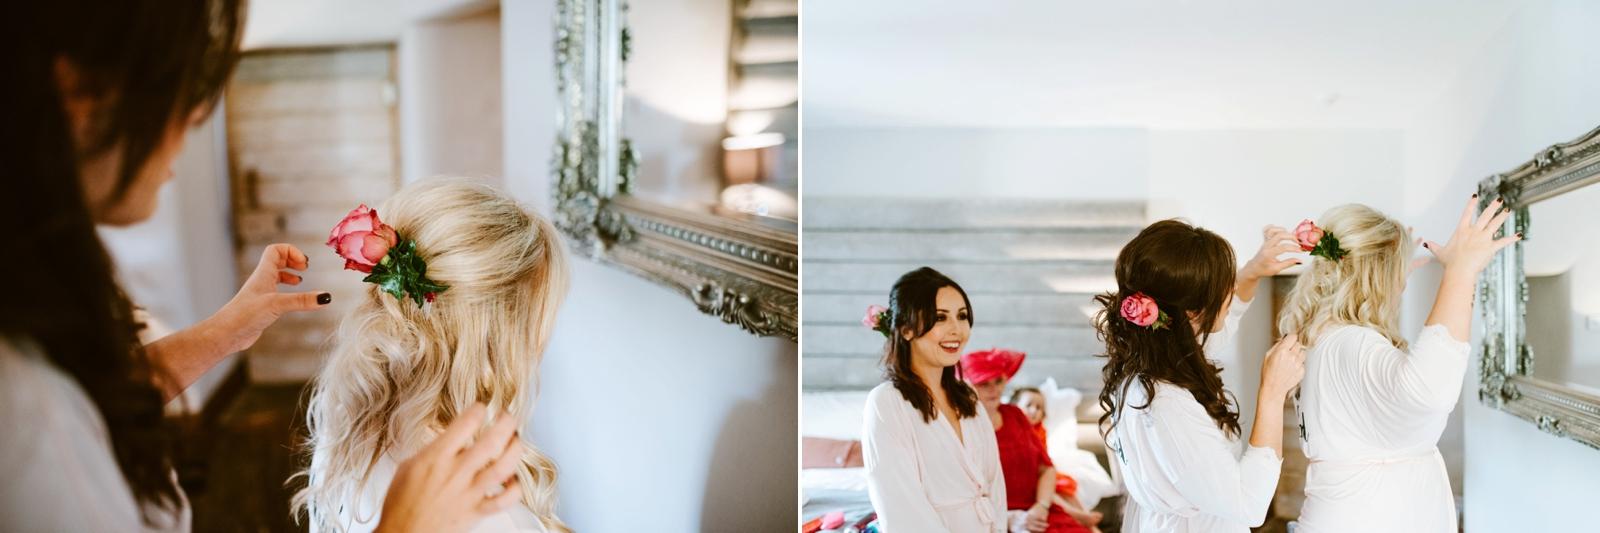 alternative-wedding-photography-scotland-katie-stephen-aikwood-tower-78.jpg